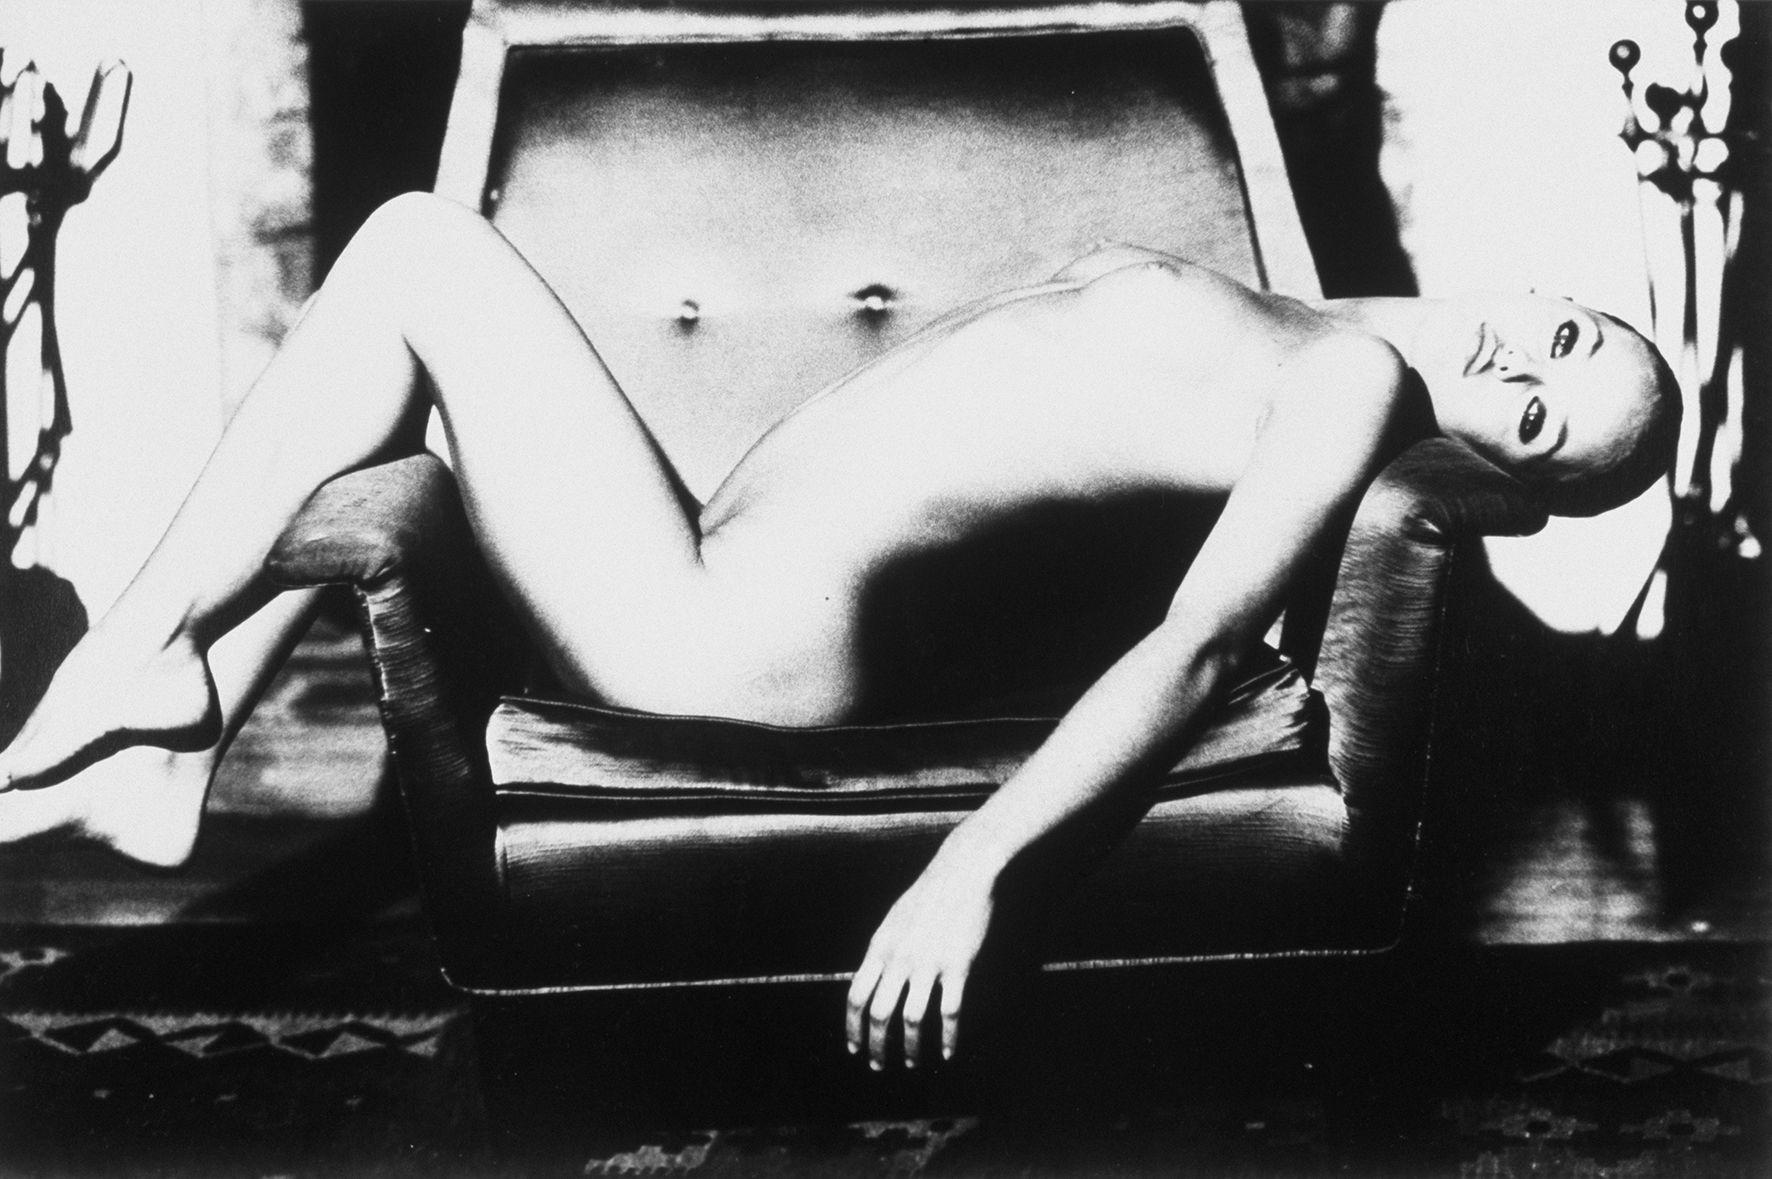 Vanessa Paradis, New York, 1991, Silver Gelatin Photogaph